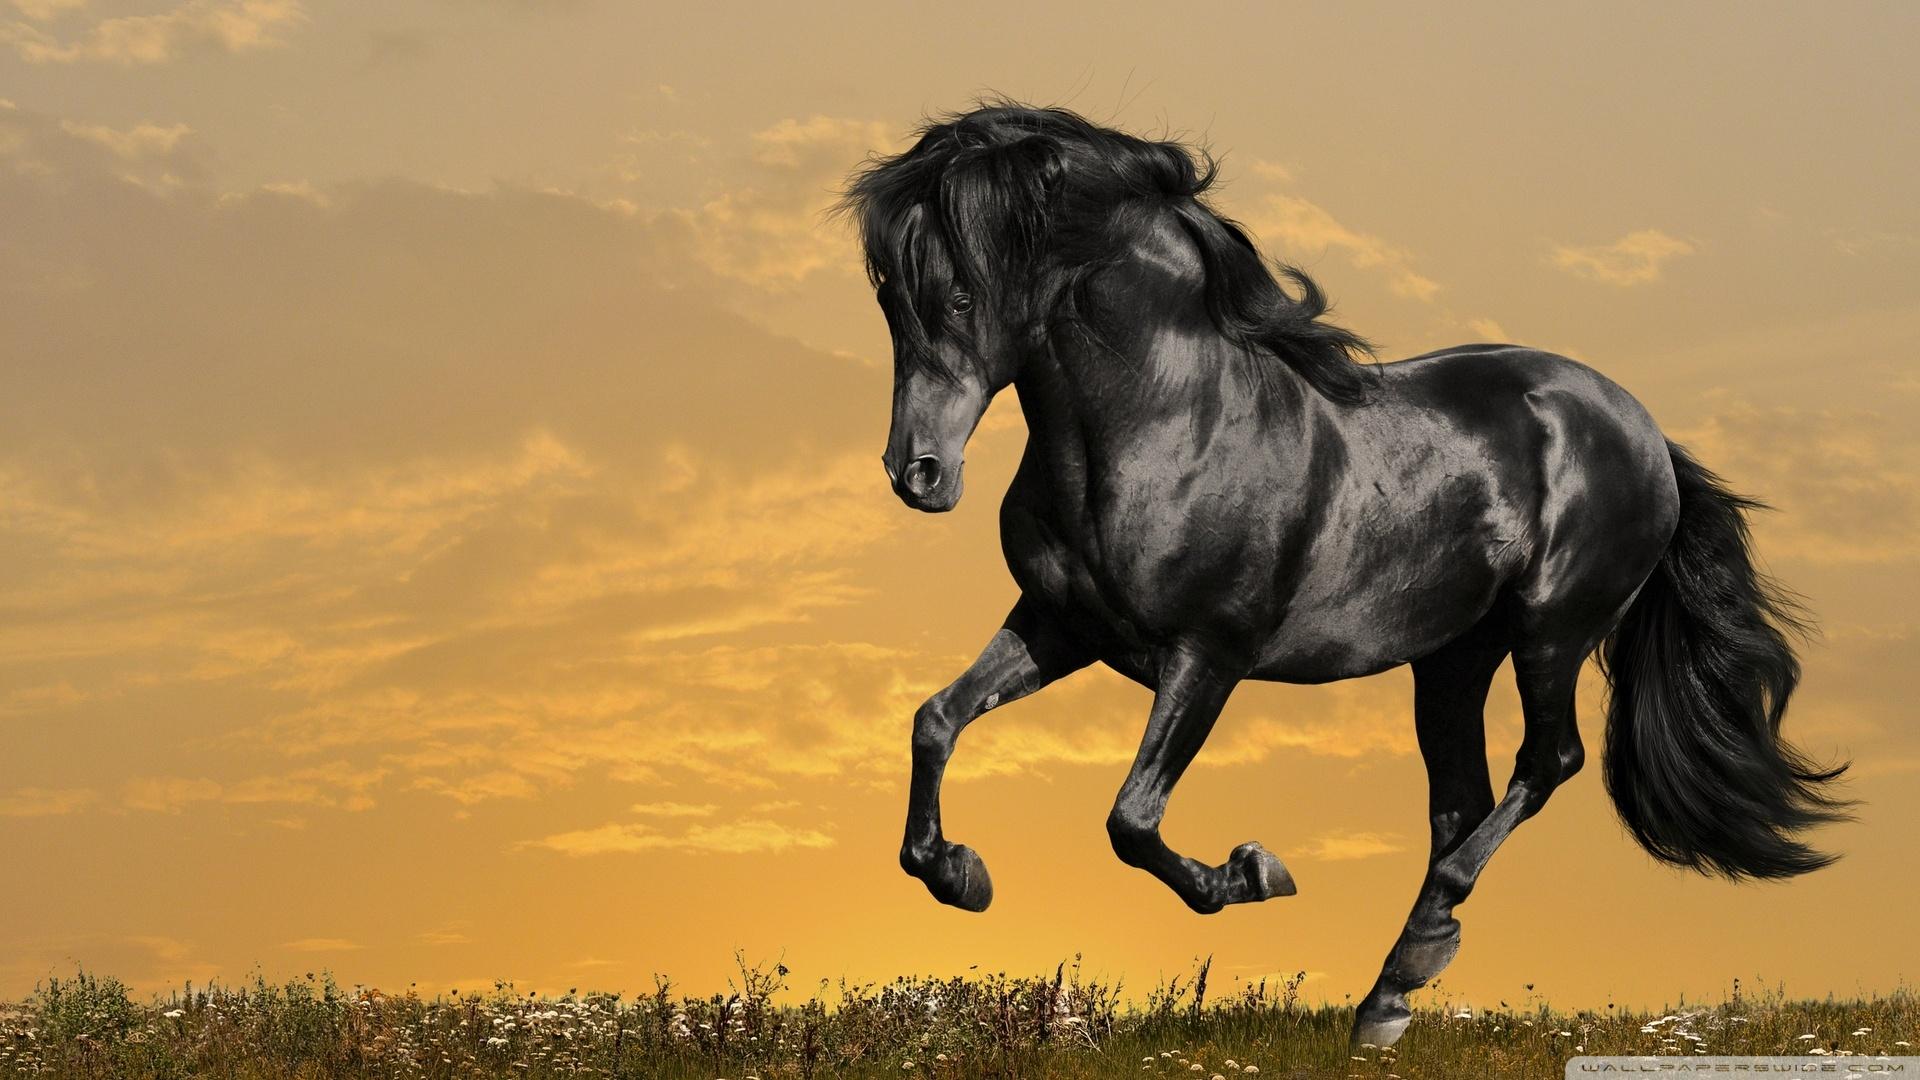 Black Horse Pictures Hd Wallpaper 1920x1080 11837